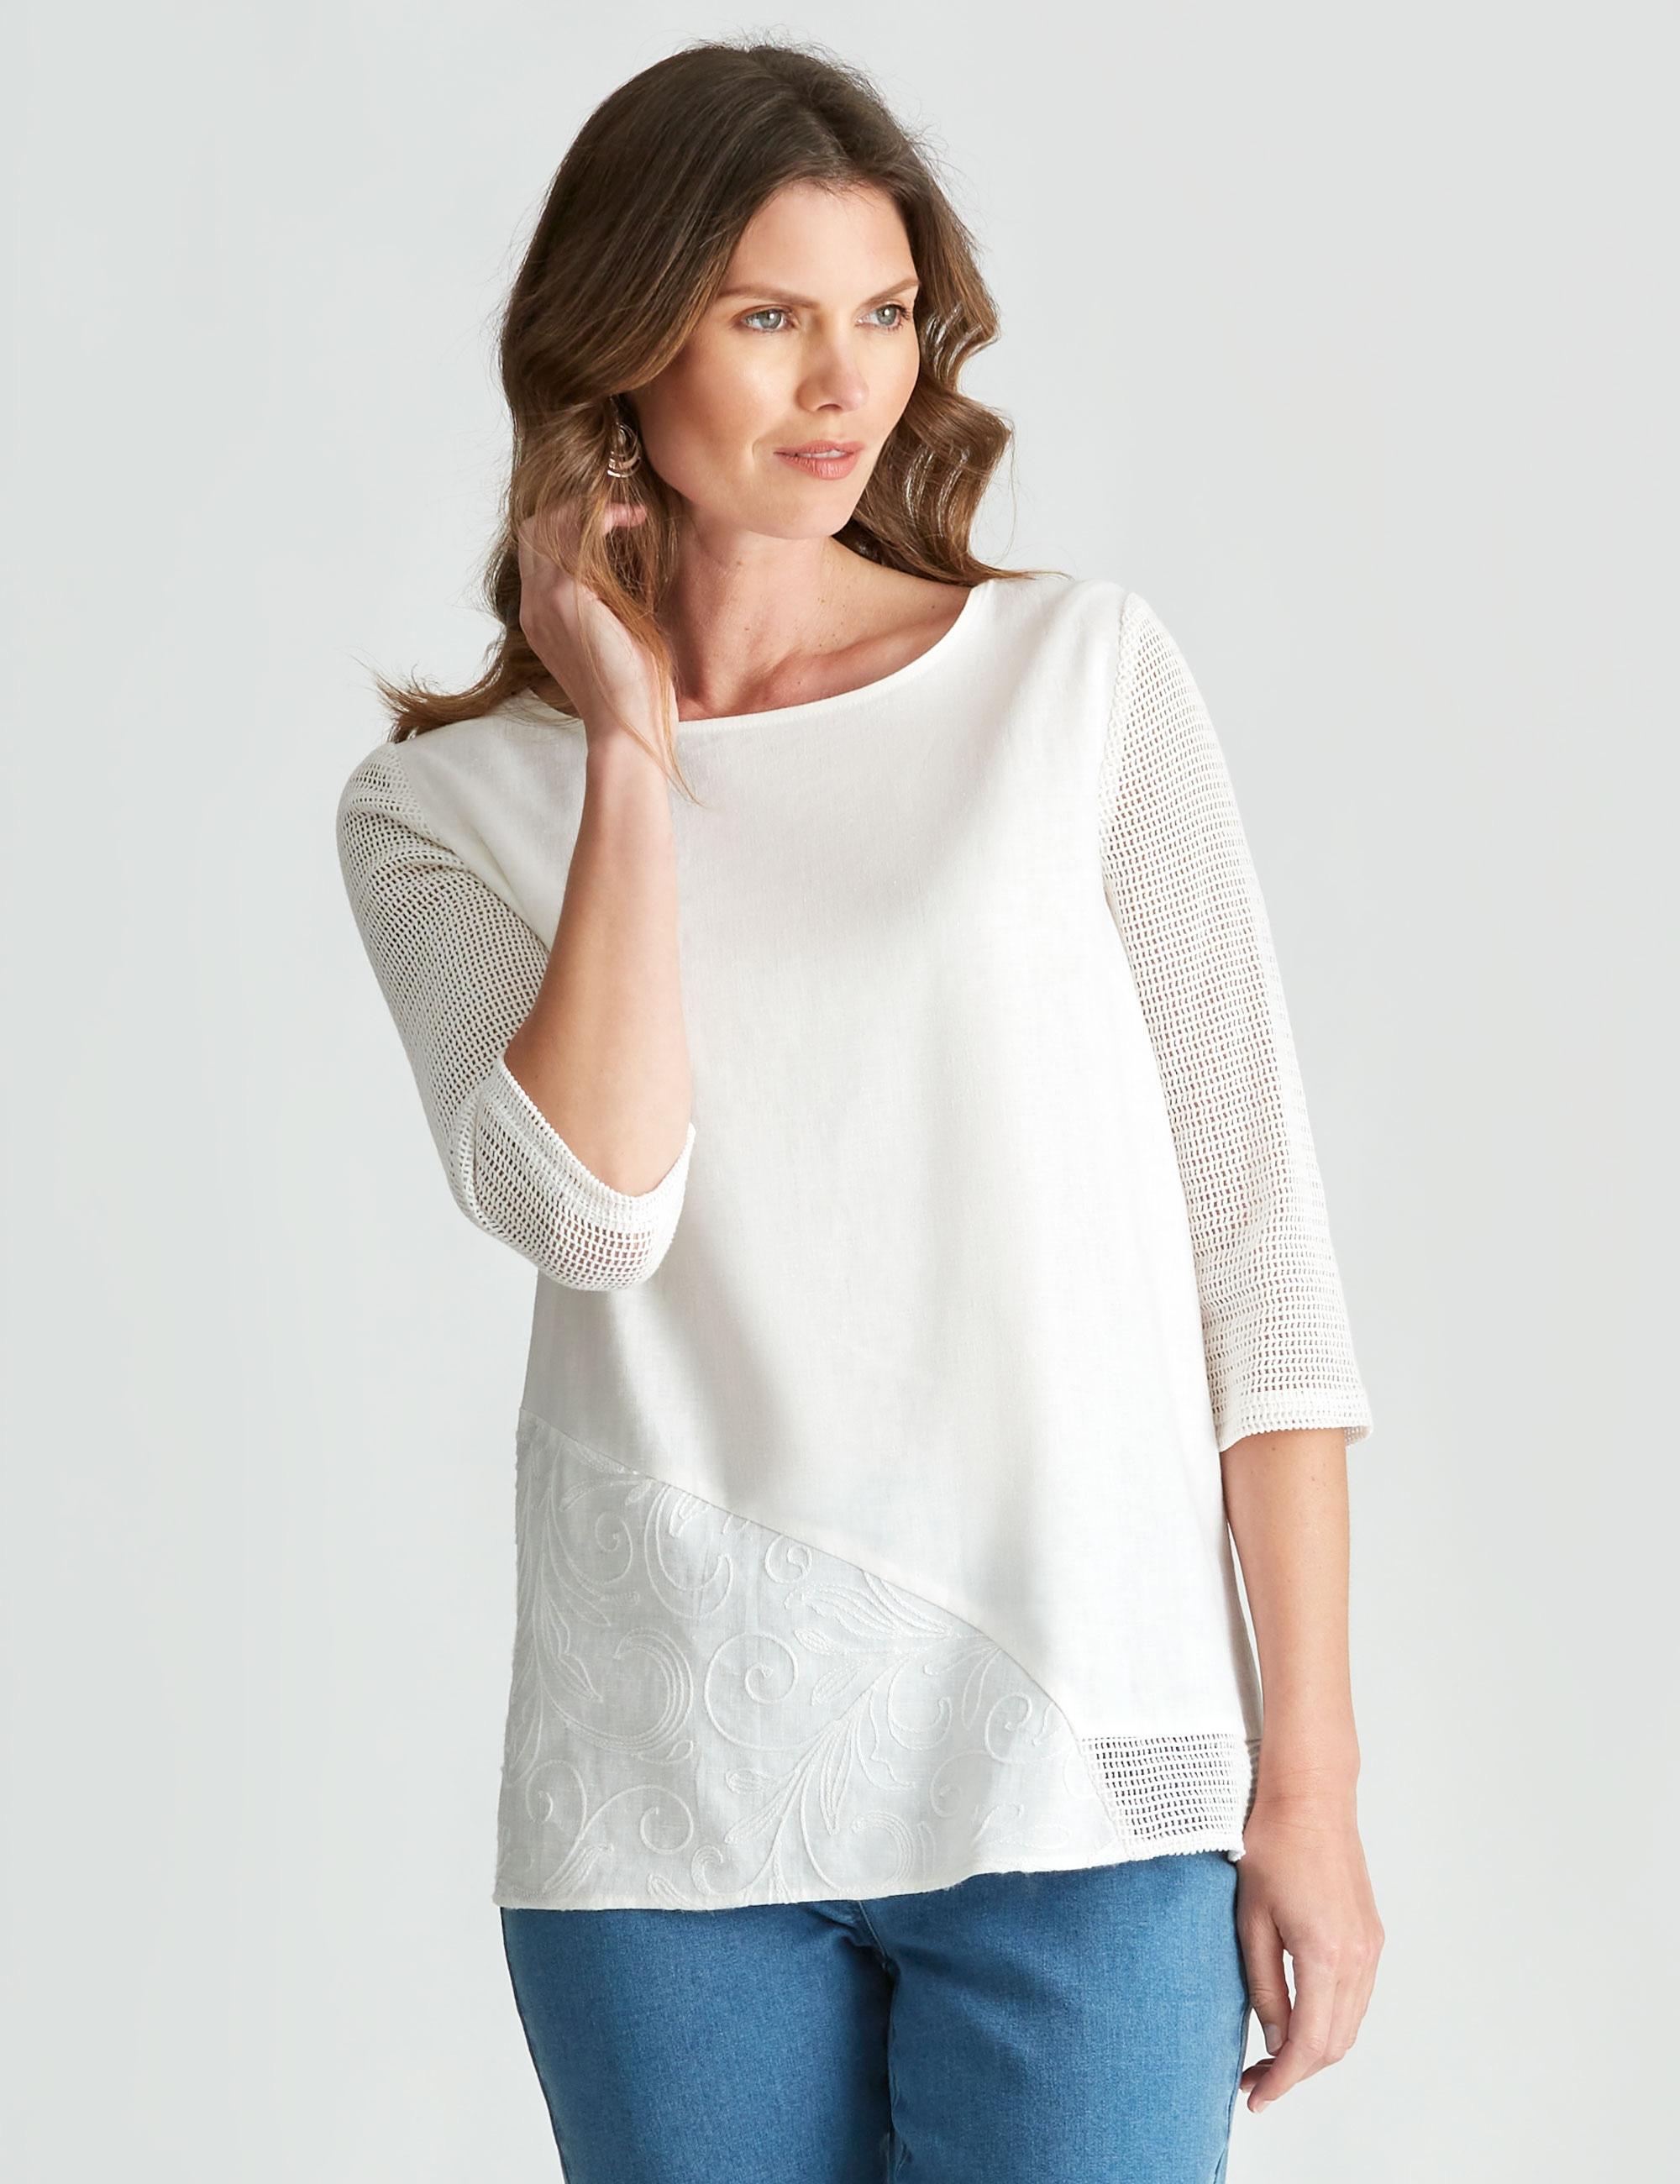 1055188100 1 - Women Fashion